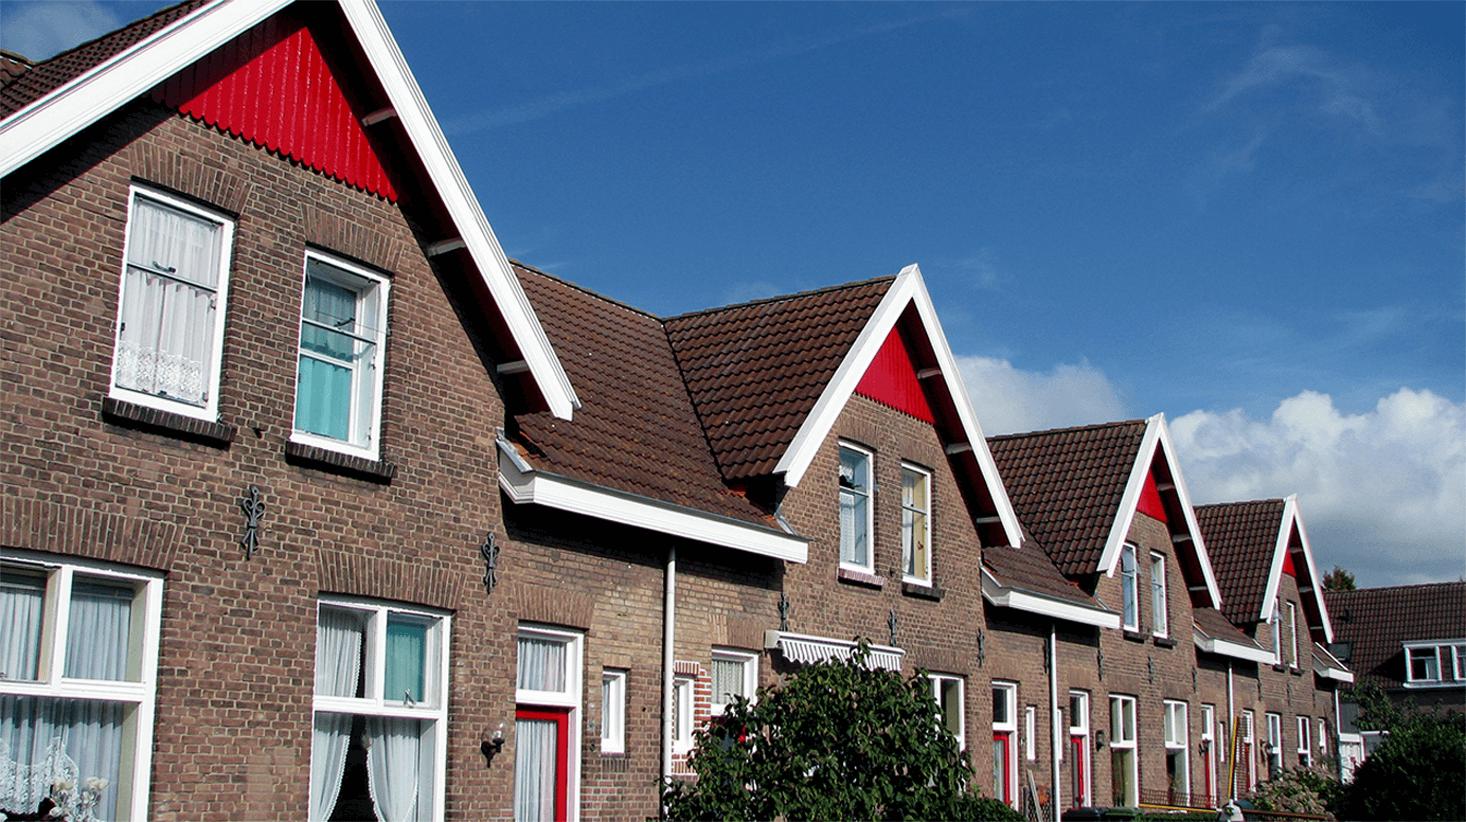 DEWONINGKOPER.NL